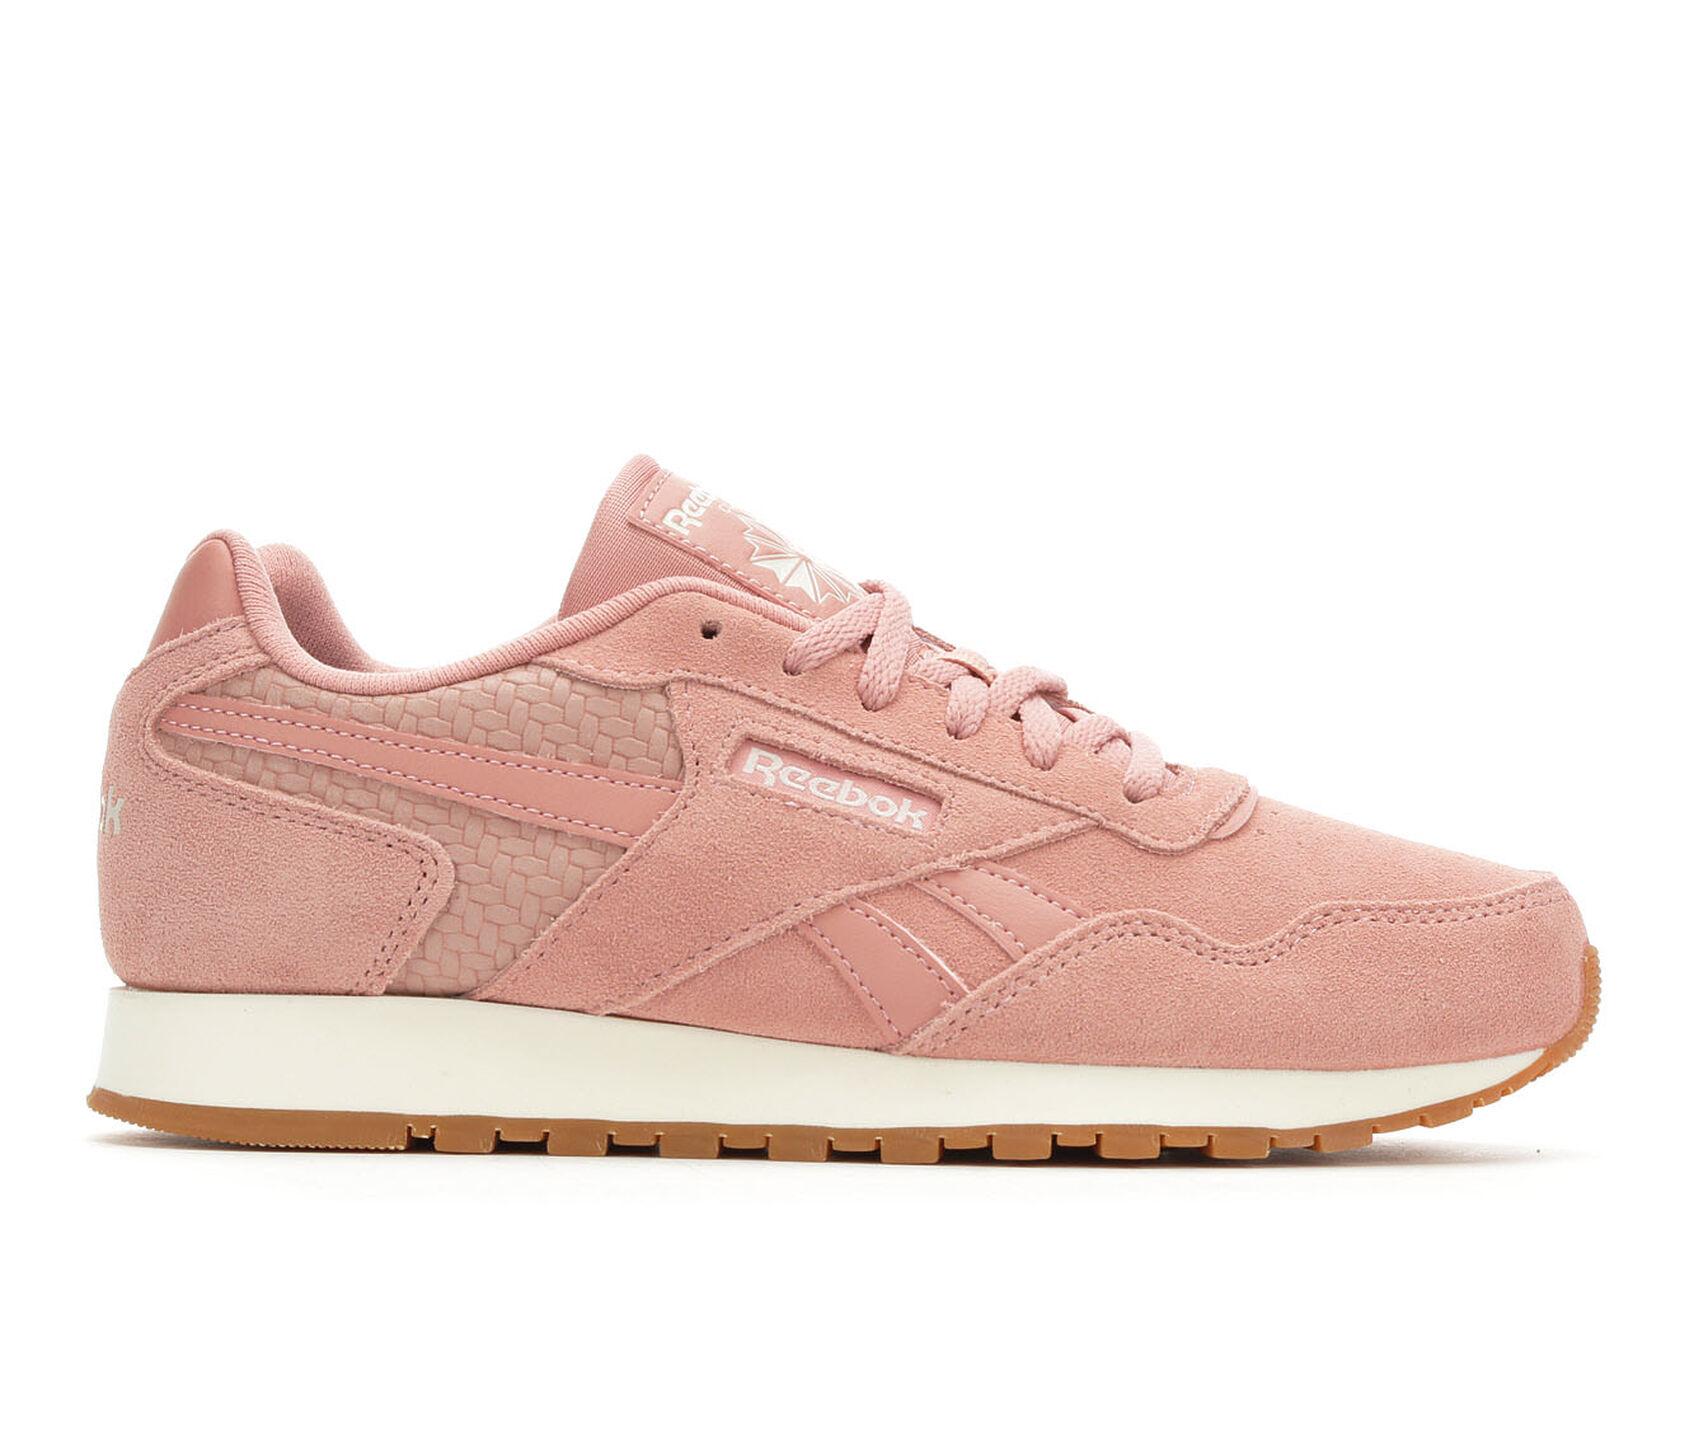 79a8a618458 ... Reebok Classic Harman Run Retro Sneakers. Previous